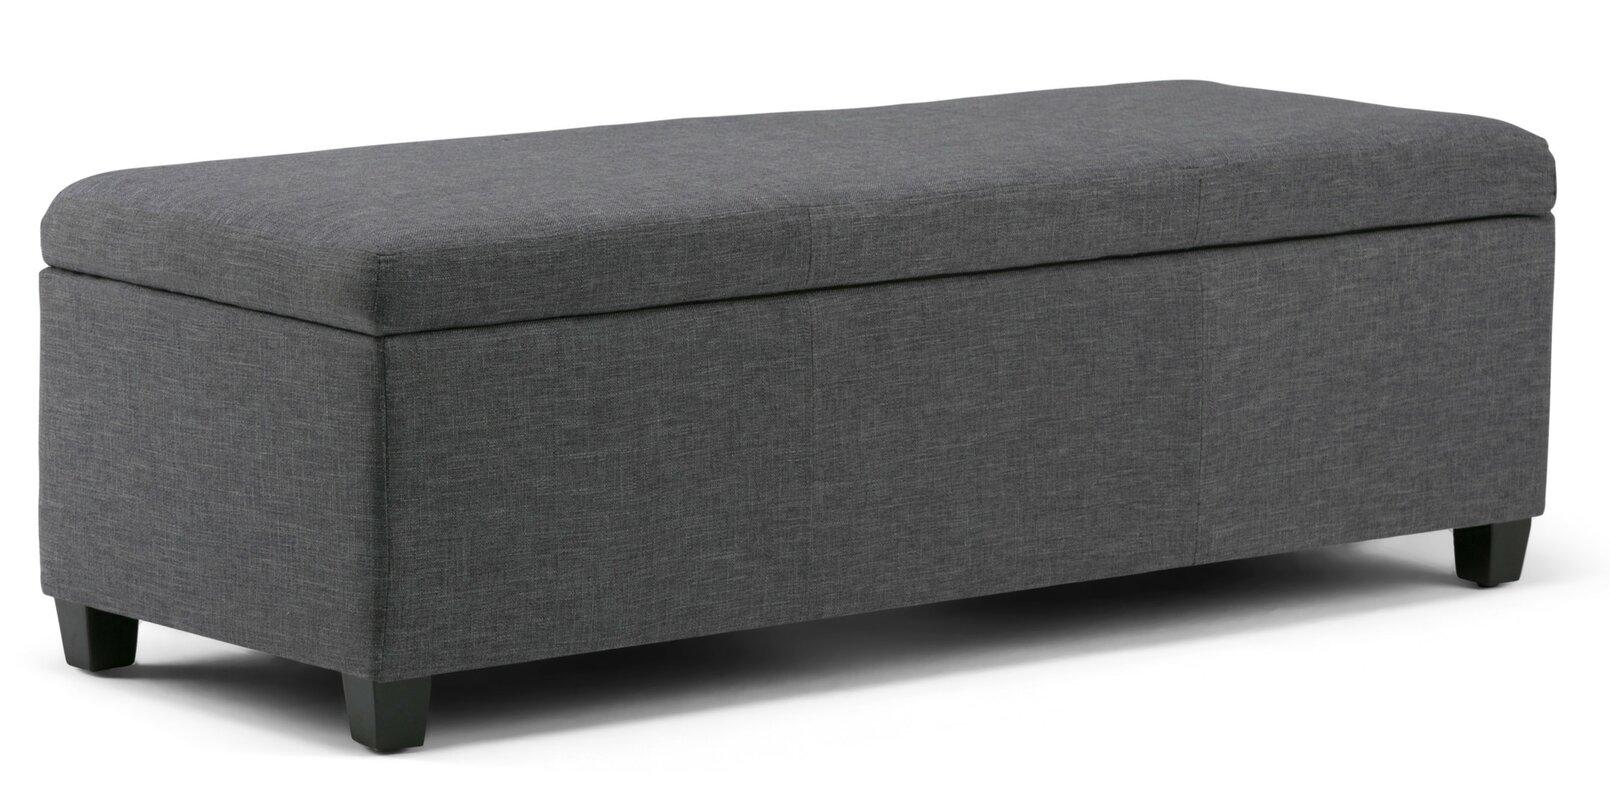 Avalon Upholstered Storage Bench